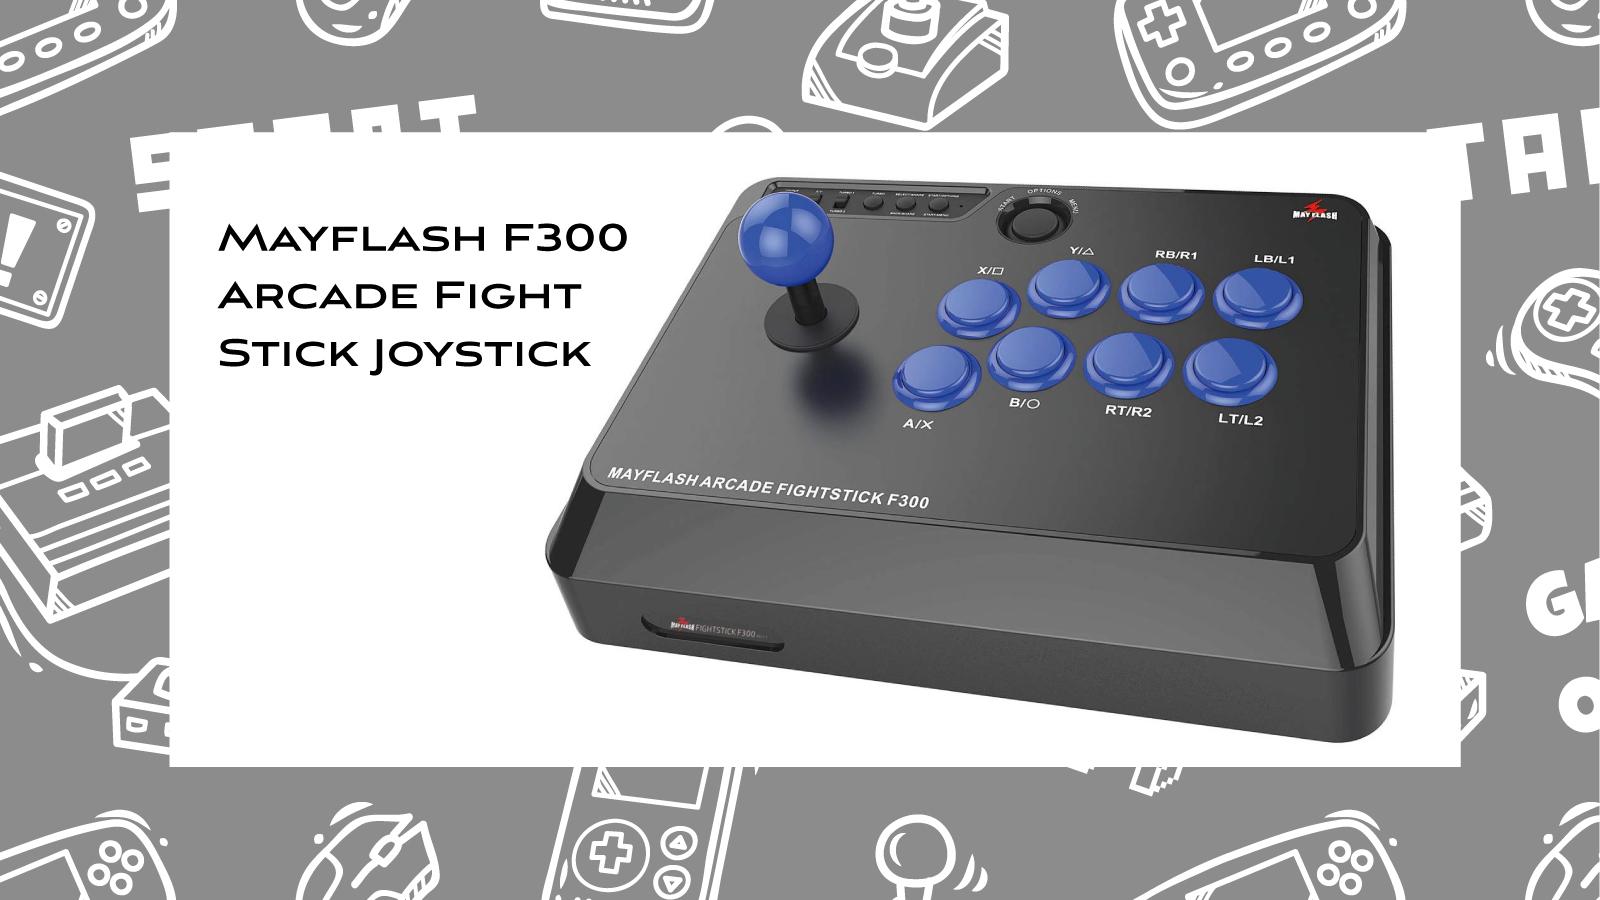 Joystick Review: Mayflash F300 Arcade Fight Stick